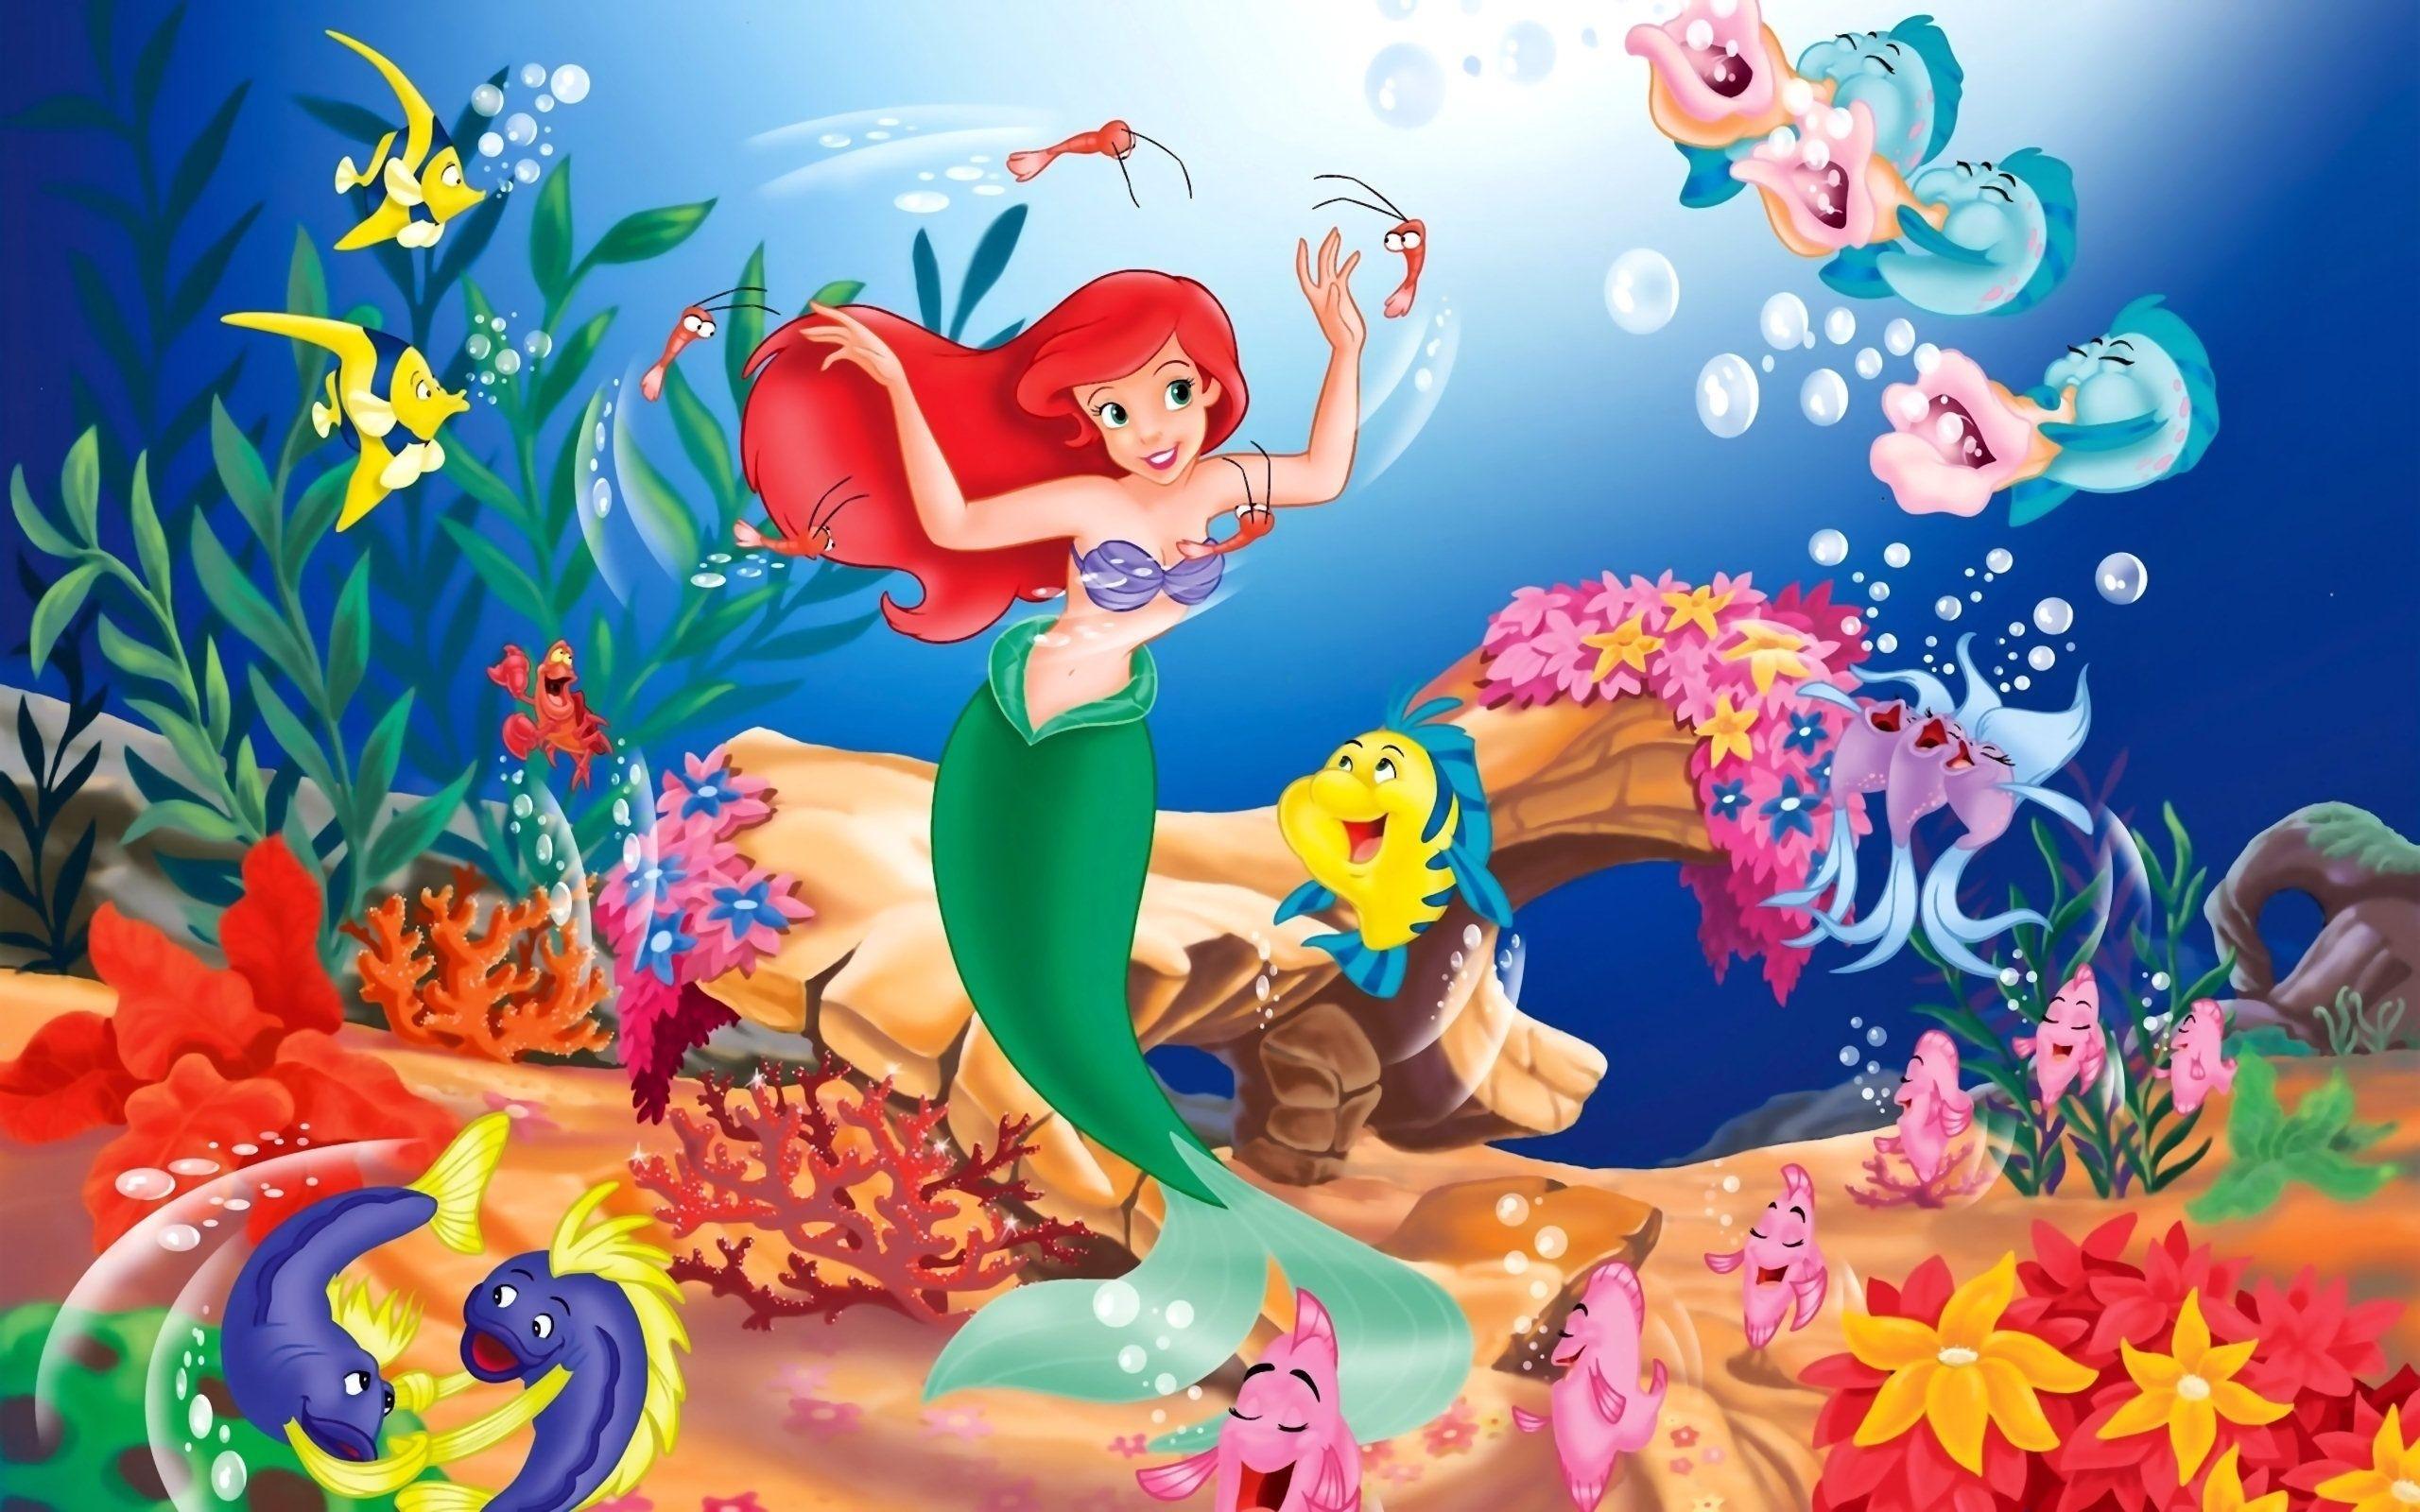 Top Wallpaper High Quality Disney - 0b5aed51f17ce5421f939b54ee272994  Graphic_878737.jpg